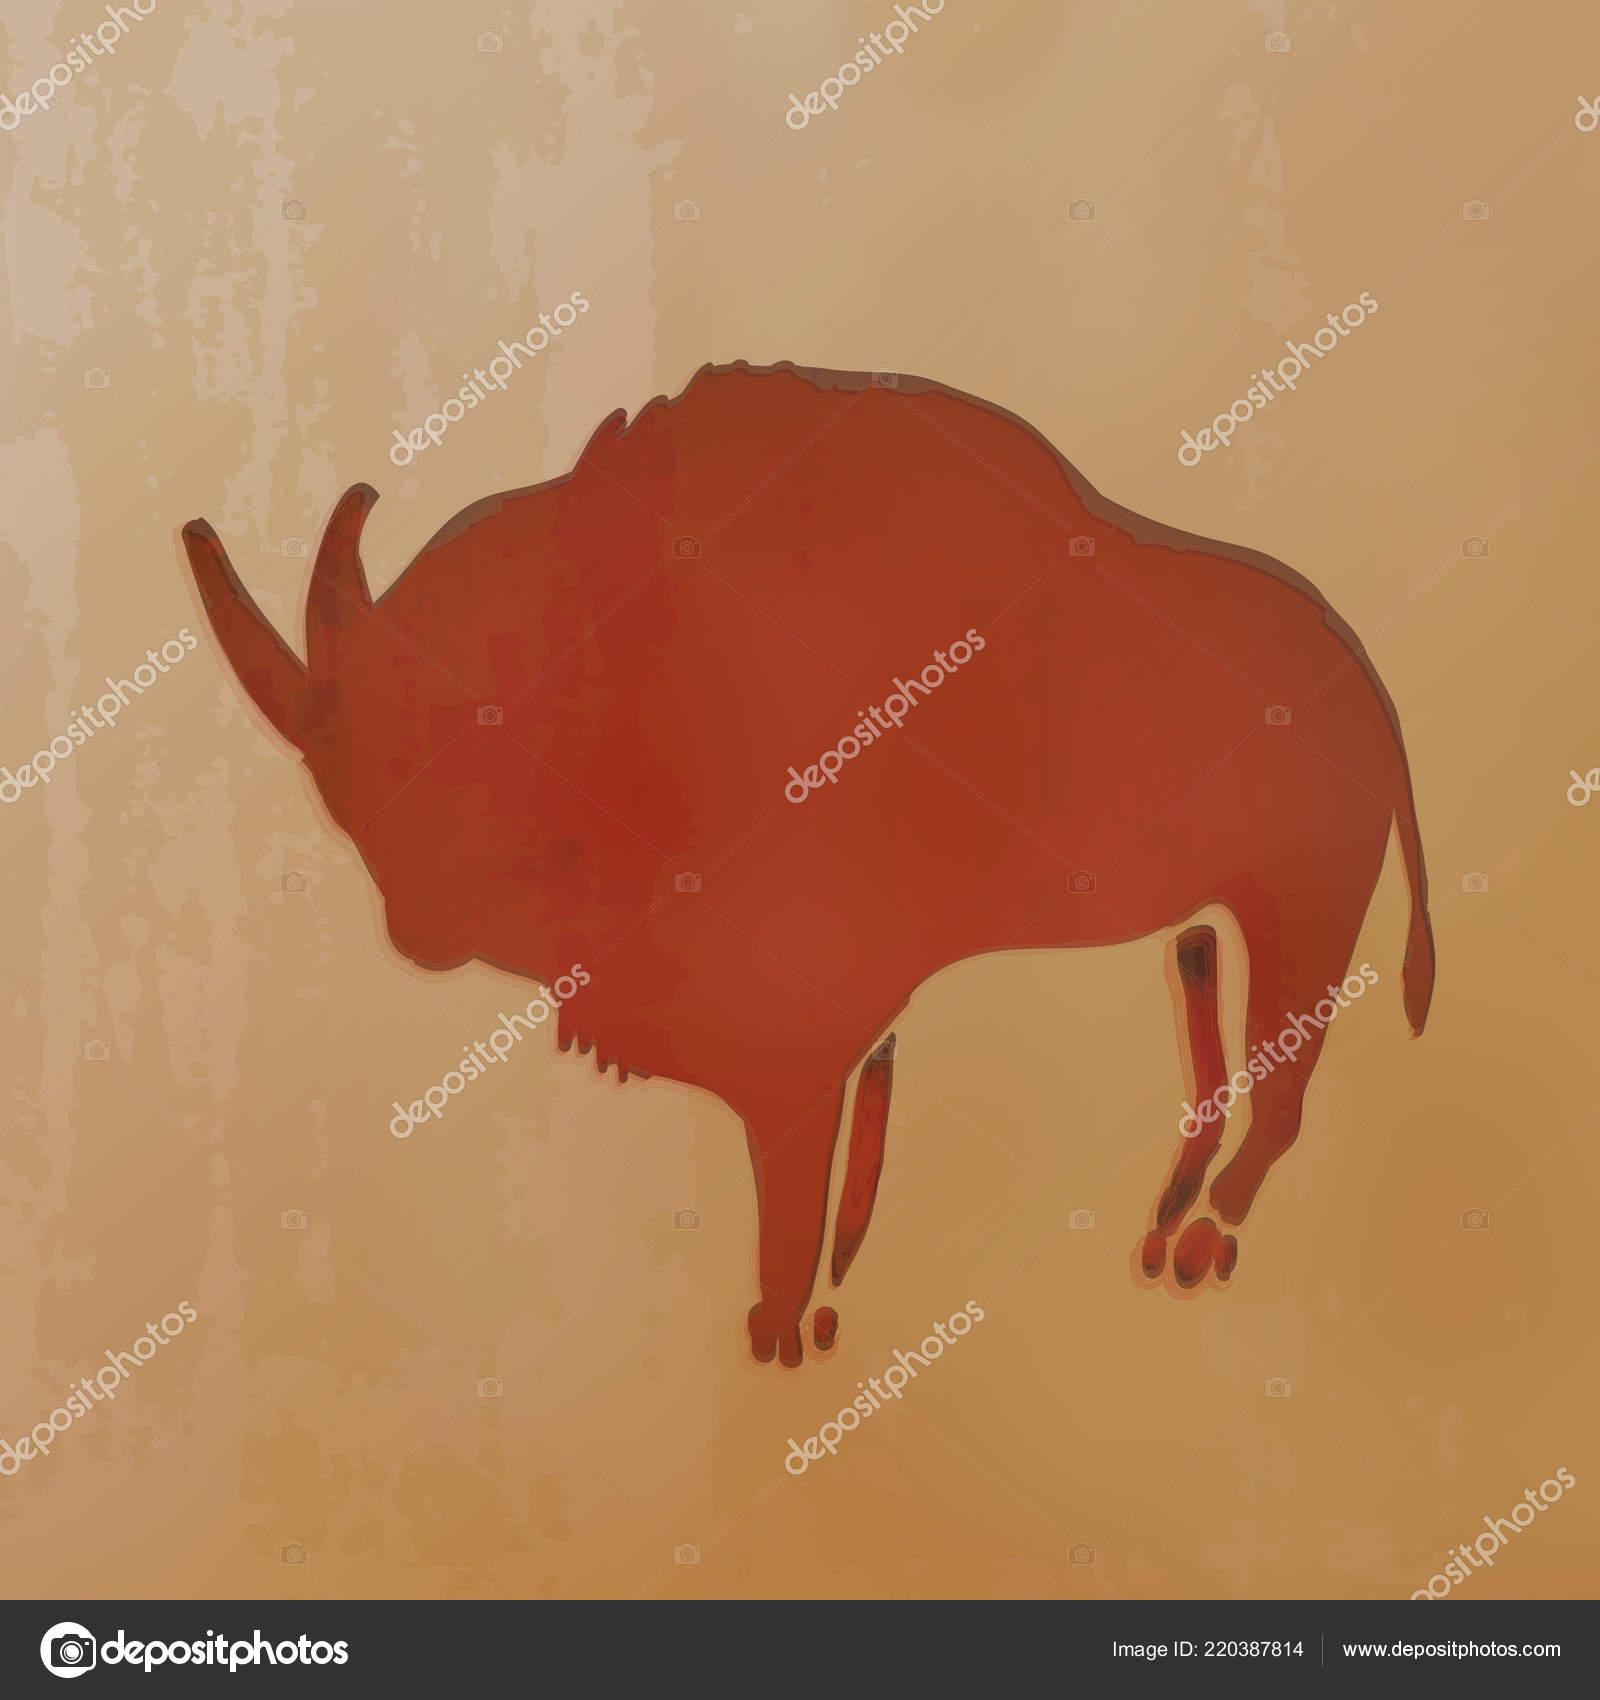 Vektorove Ilustrace Cervena Hlina Nakreslene Staroveke Jeskynni